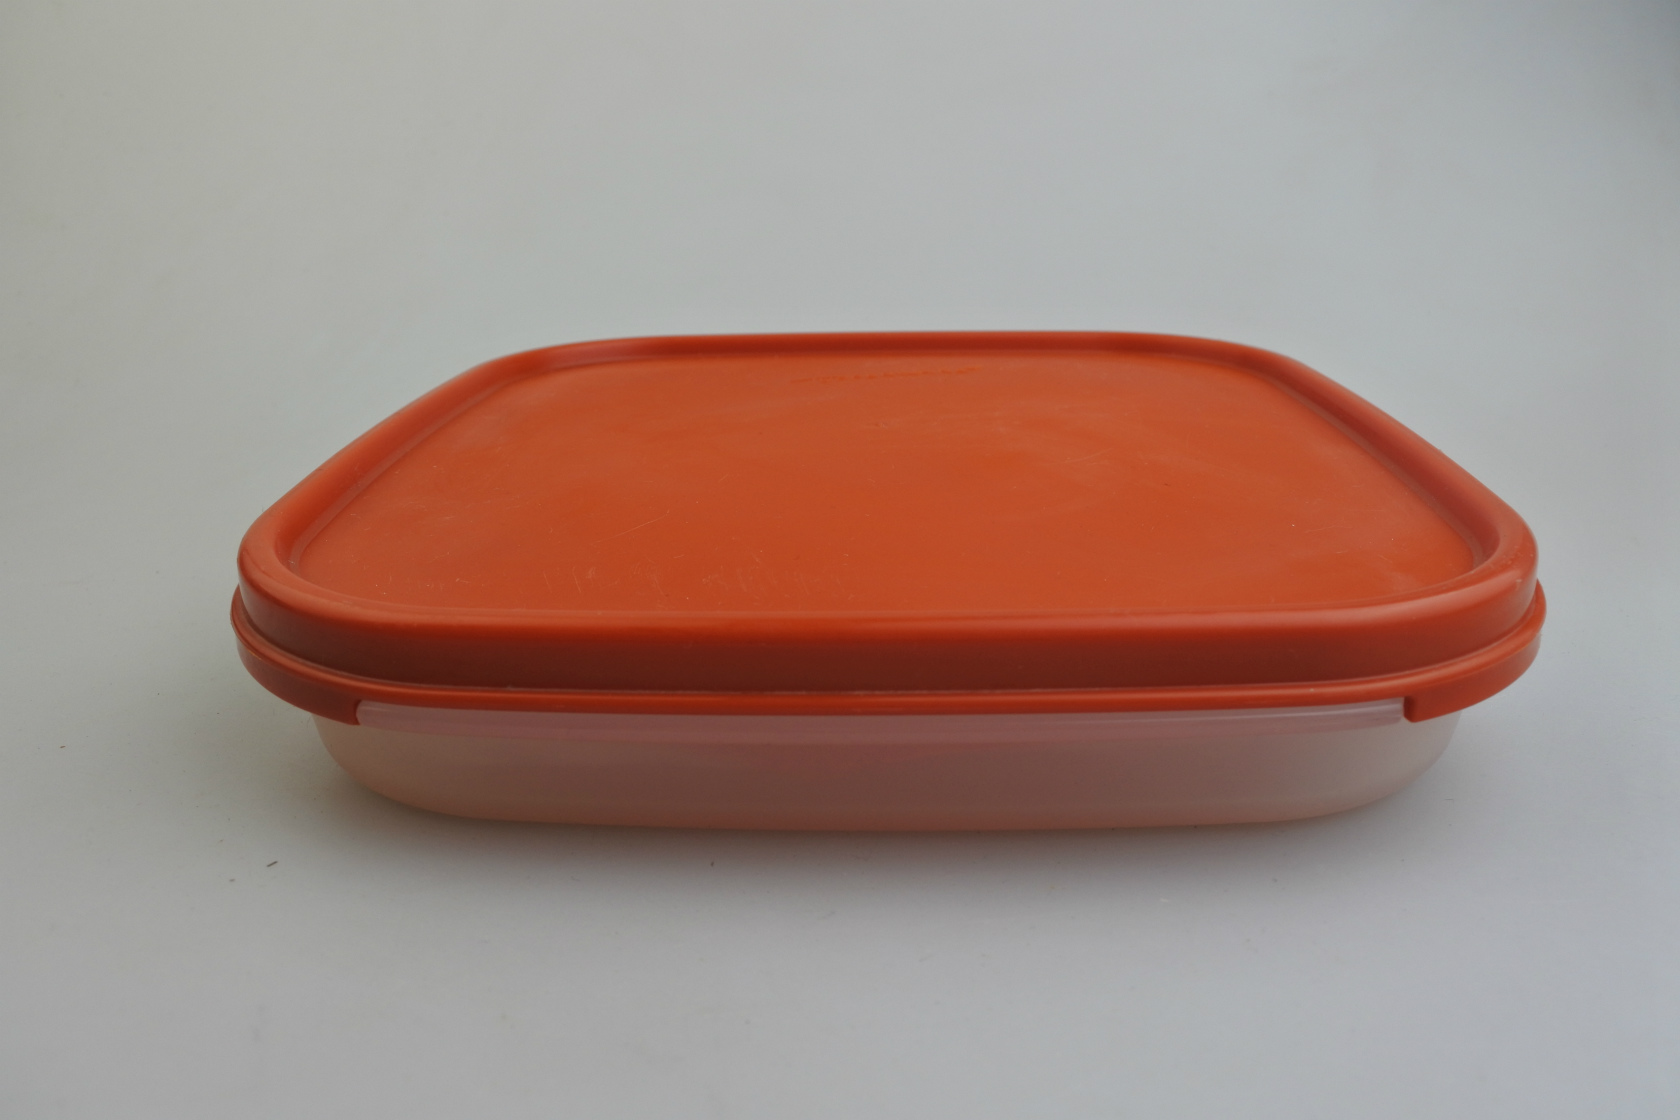 tupperware-squaresunoko-cren